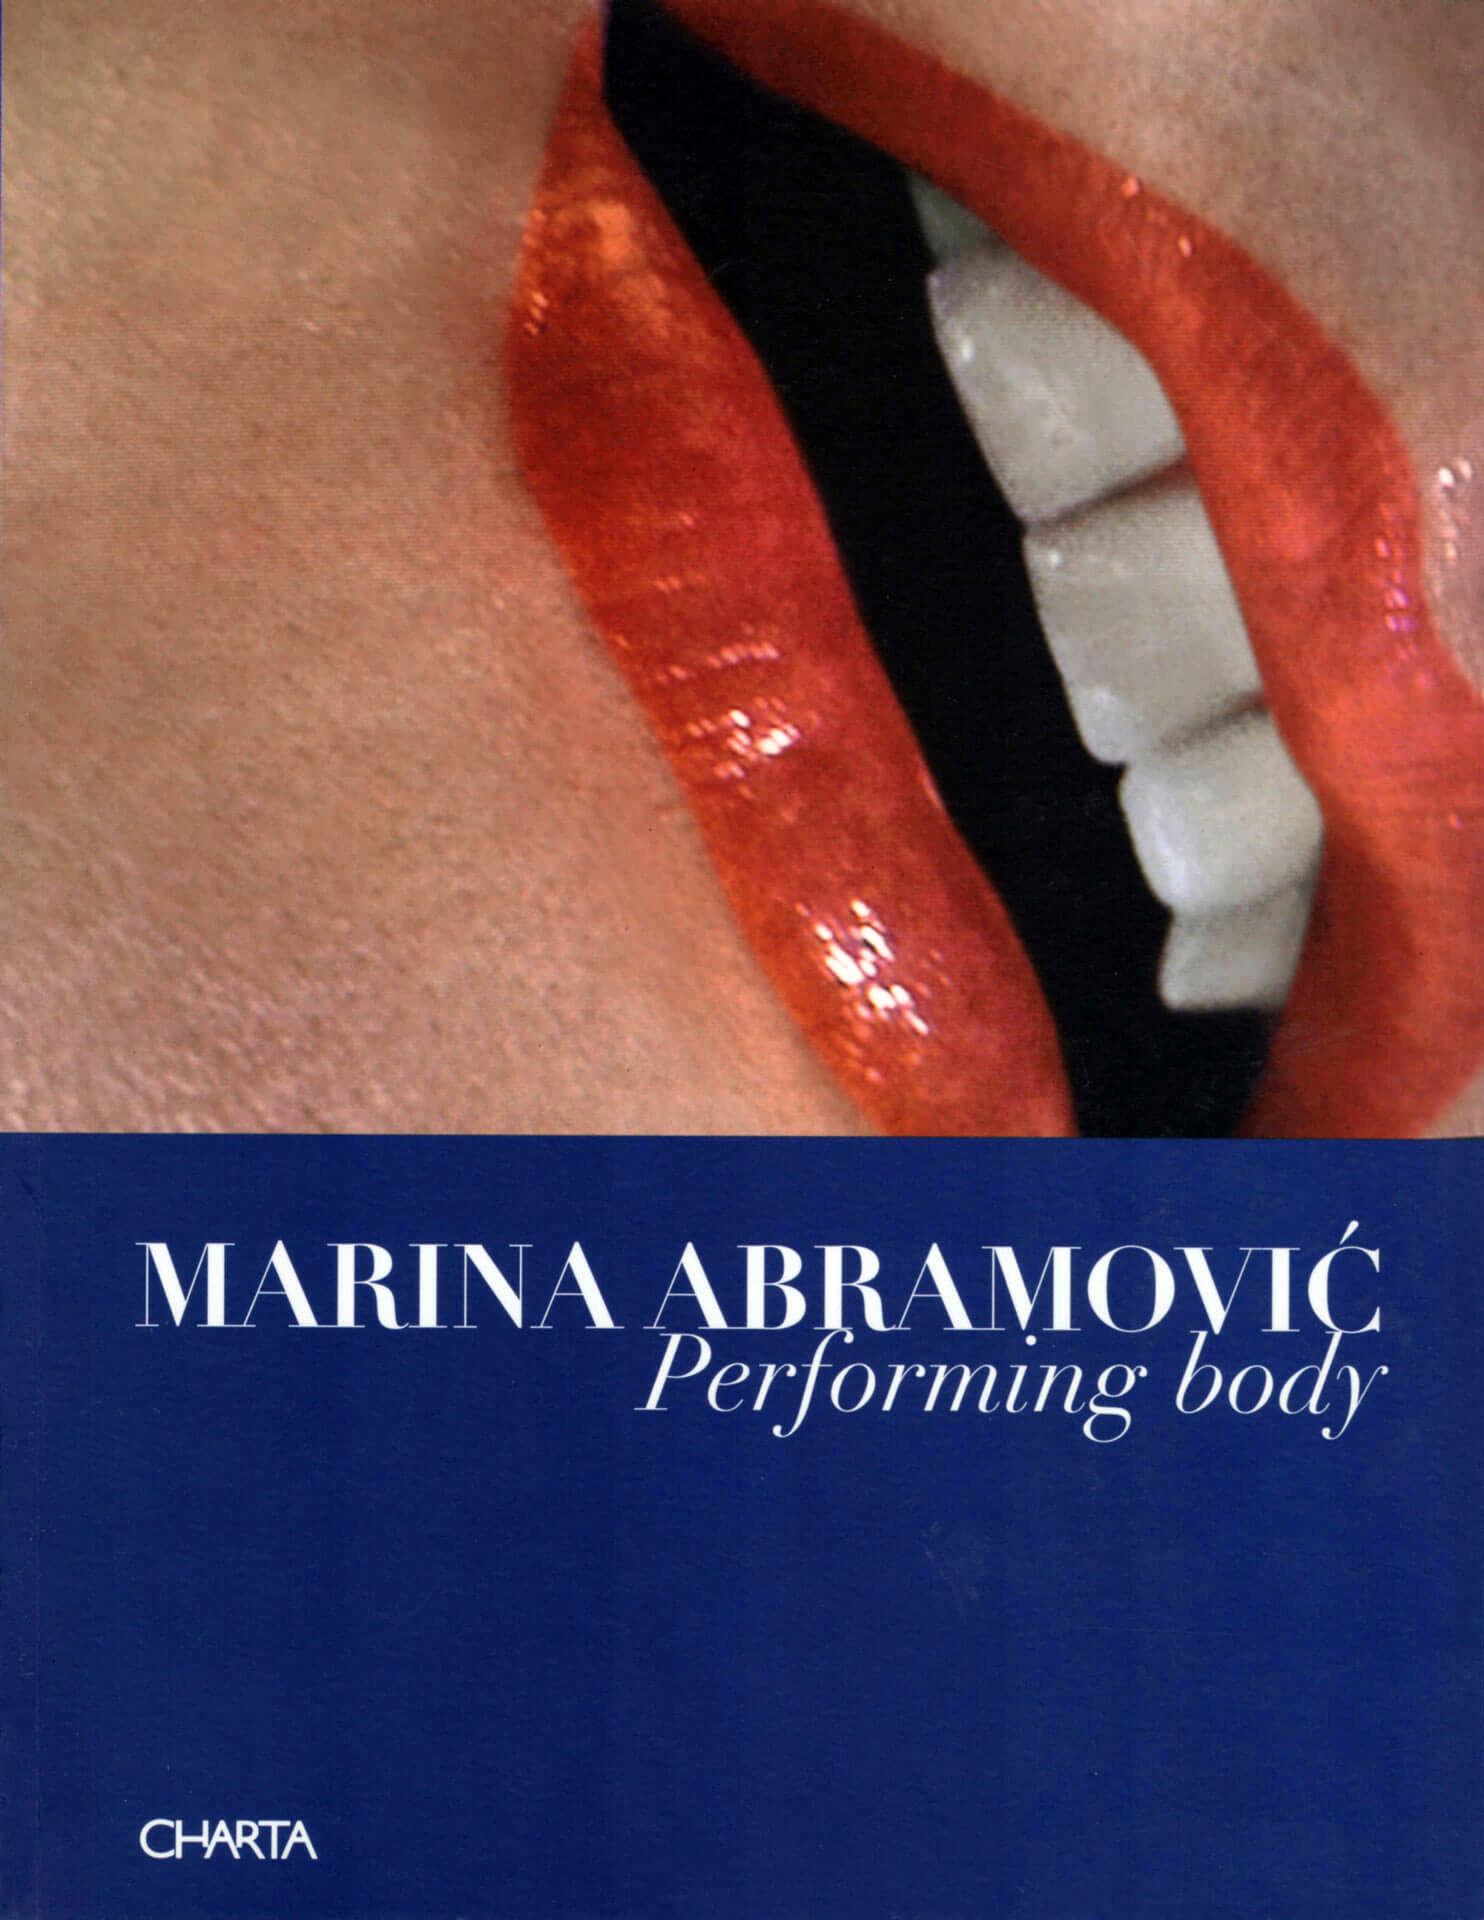 Studio Stefania Miscetti | Catalogues | Marina Abramovic | Performing Body